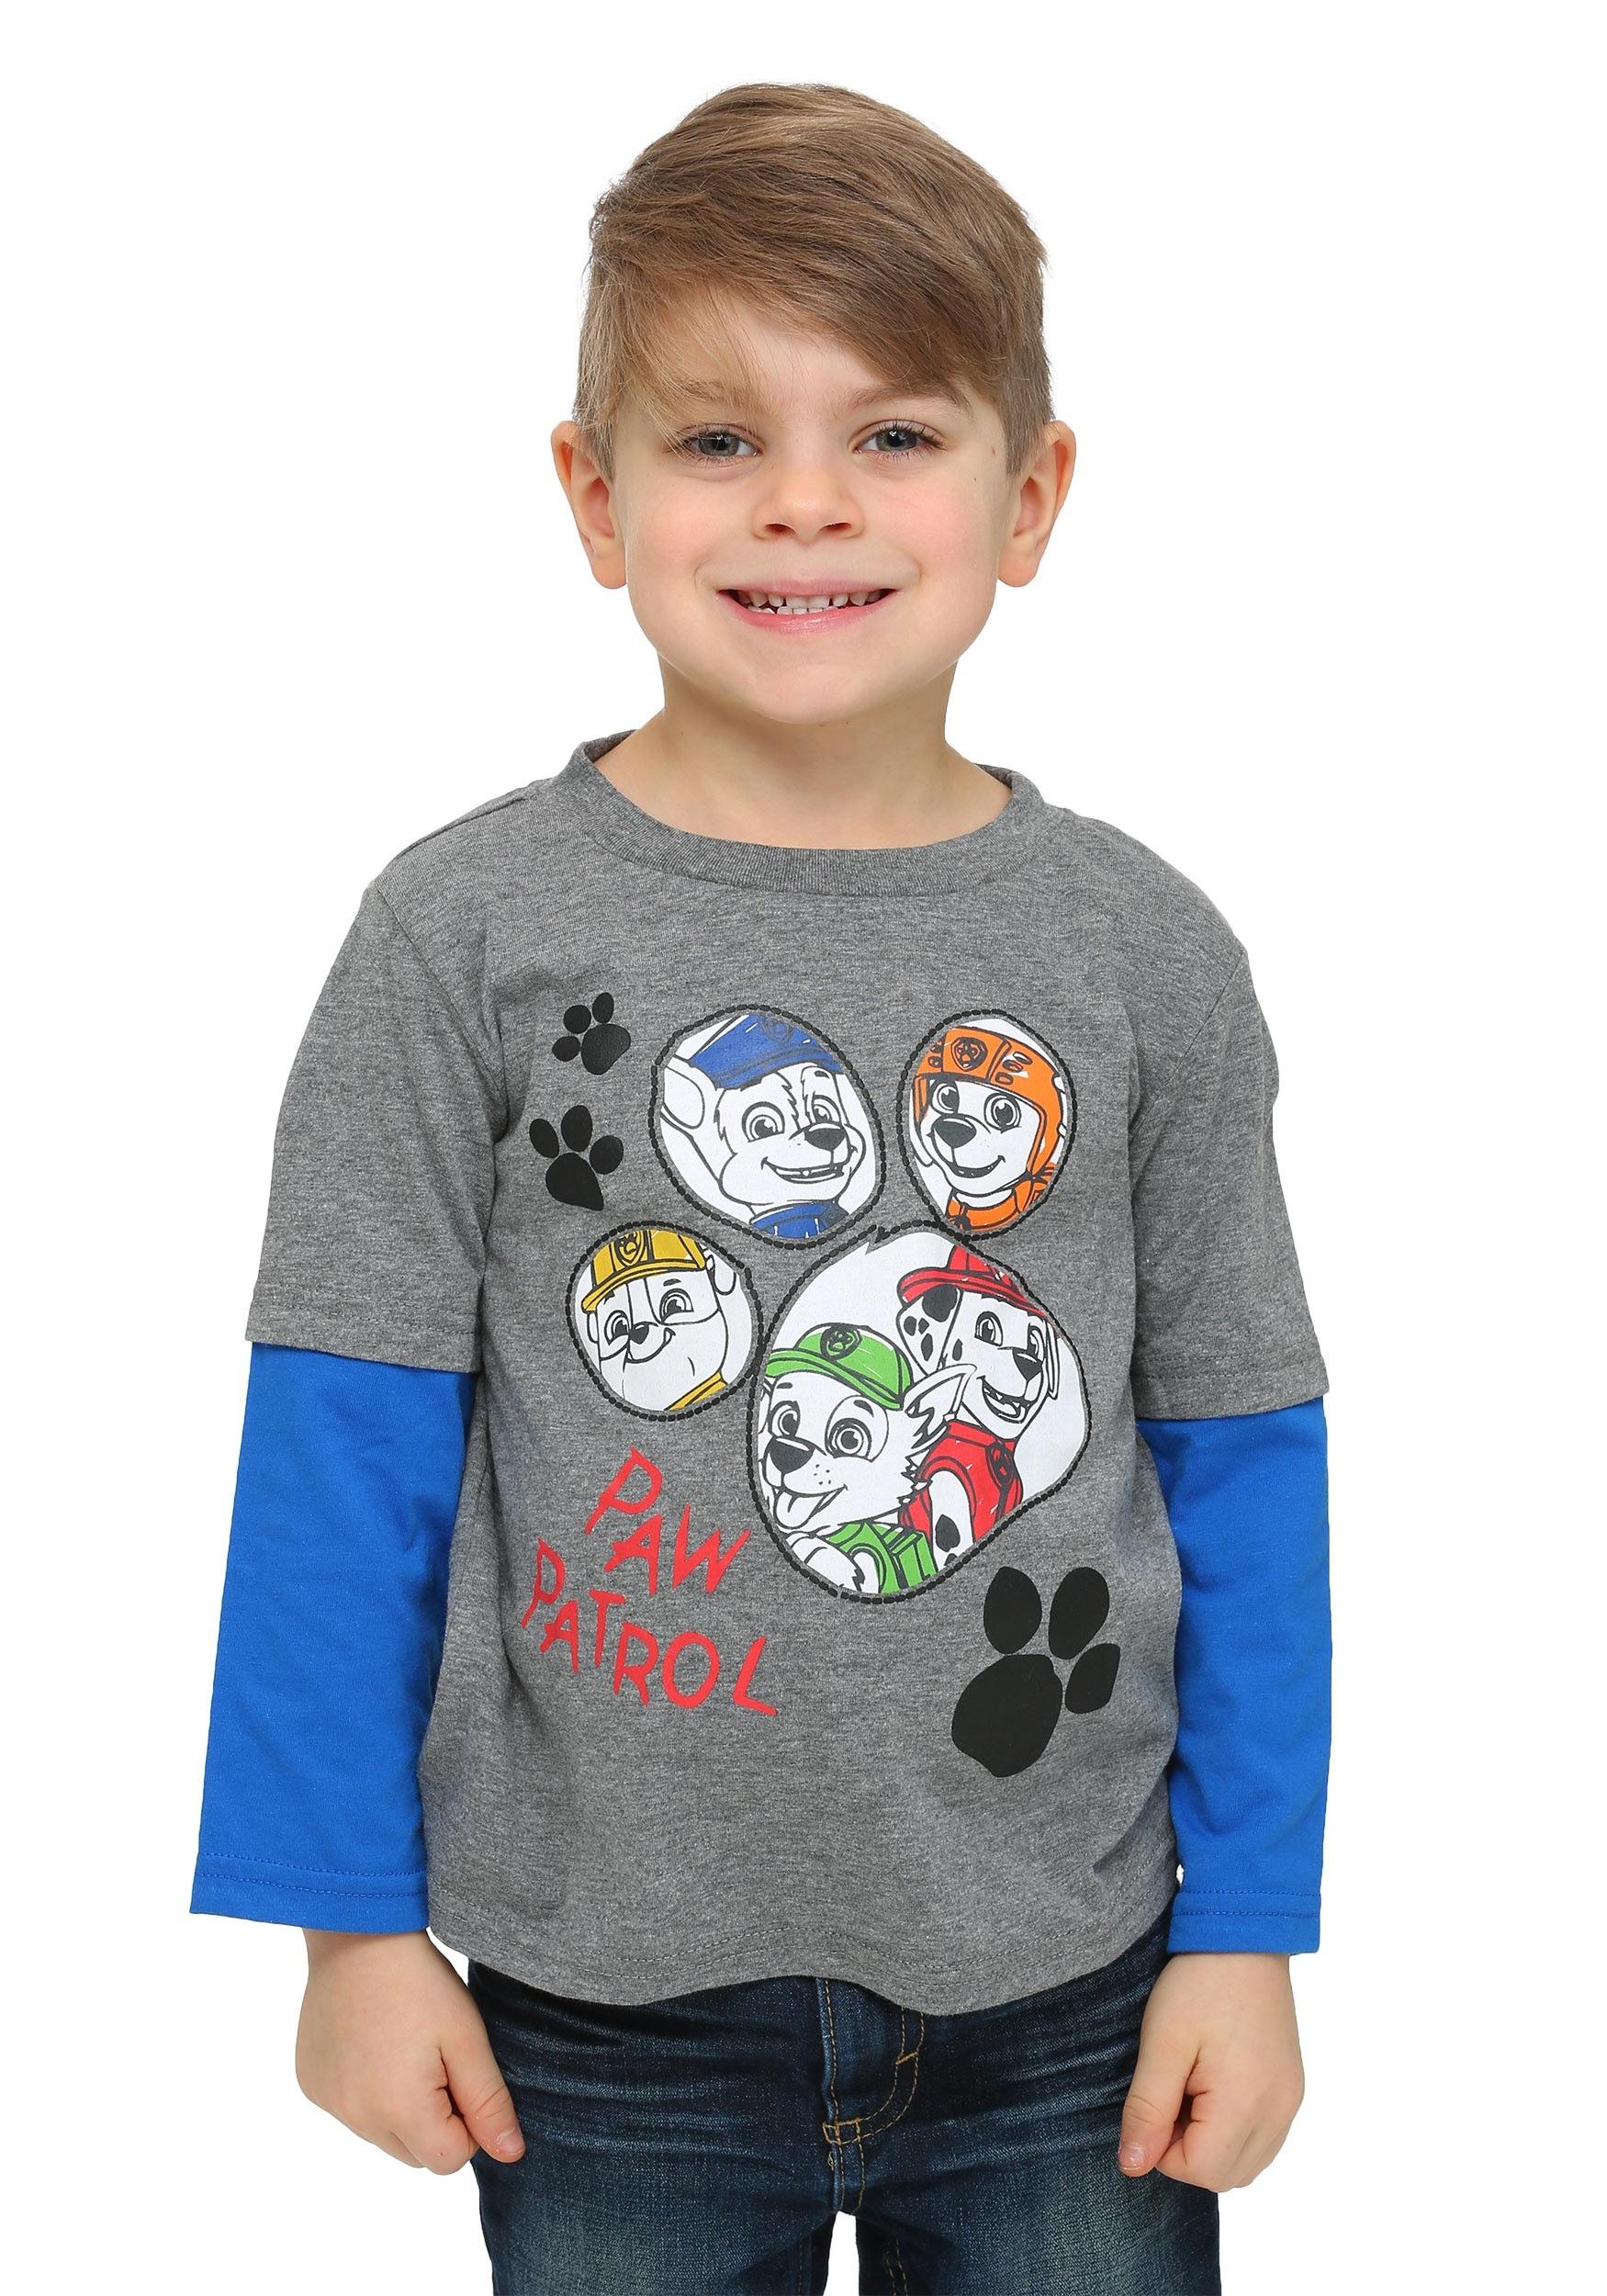 0448a69c86e0 Paw Patrol Paw Print Toddler Boys Long Sleeve Twofer